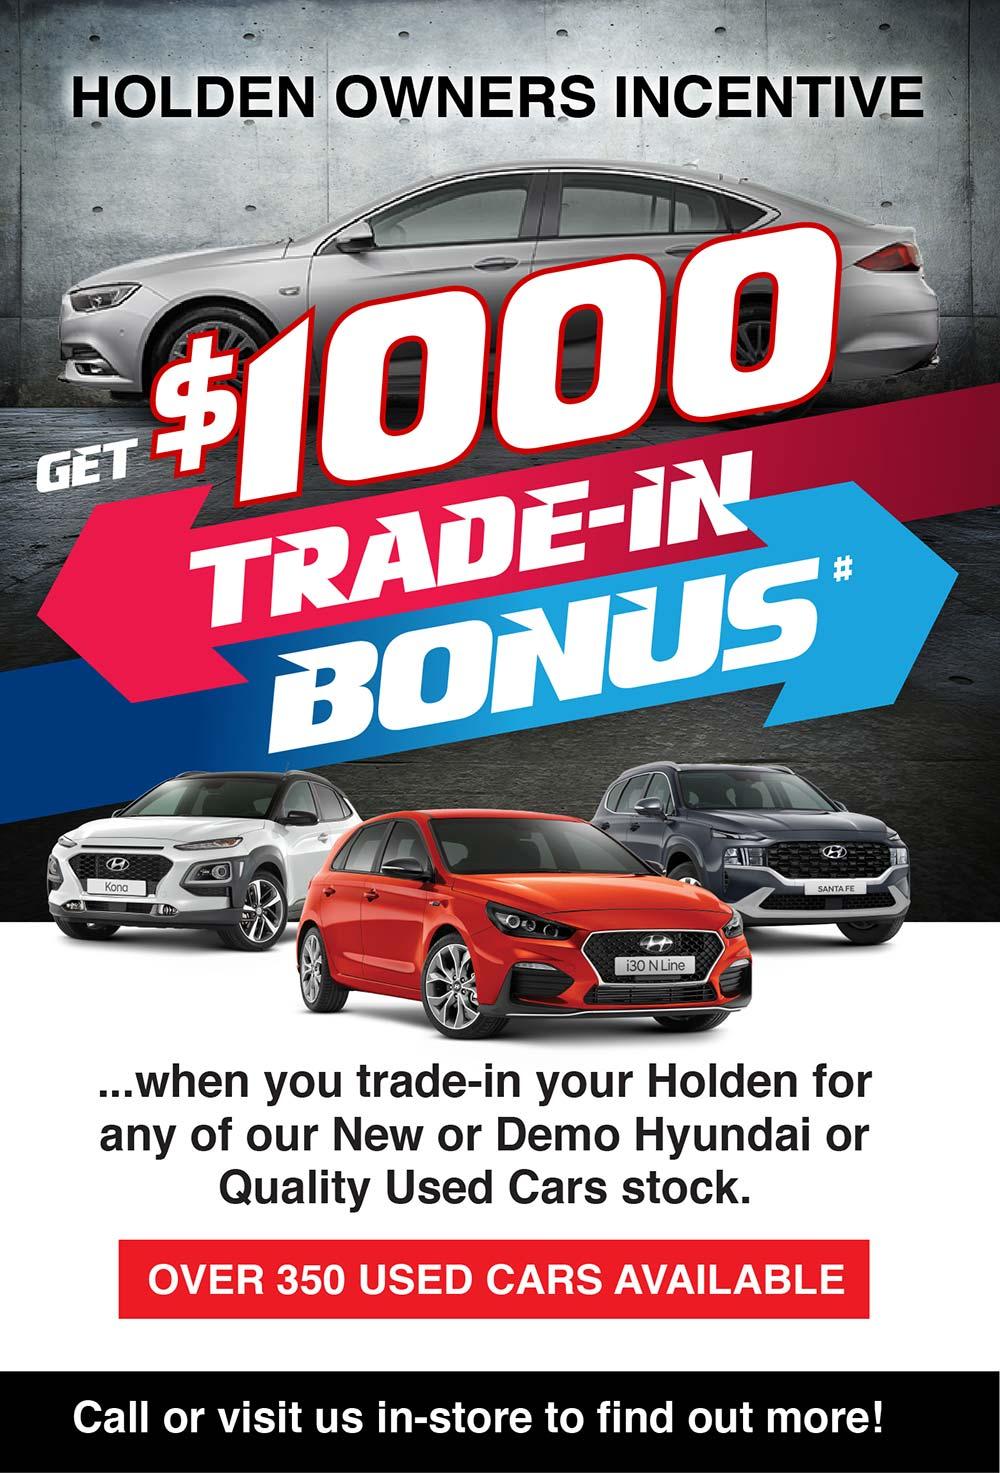 Steinborner Hyundai Barossa | Holden Owners Incentive Special Offer